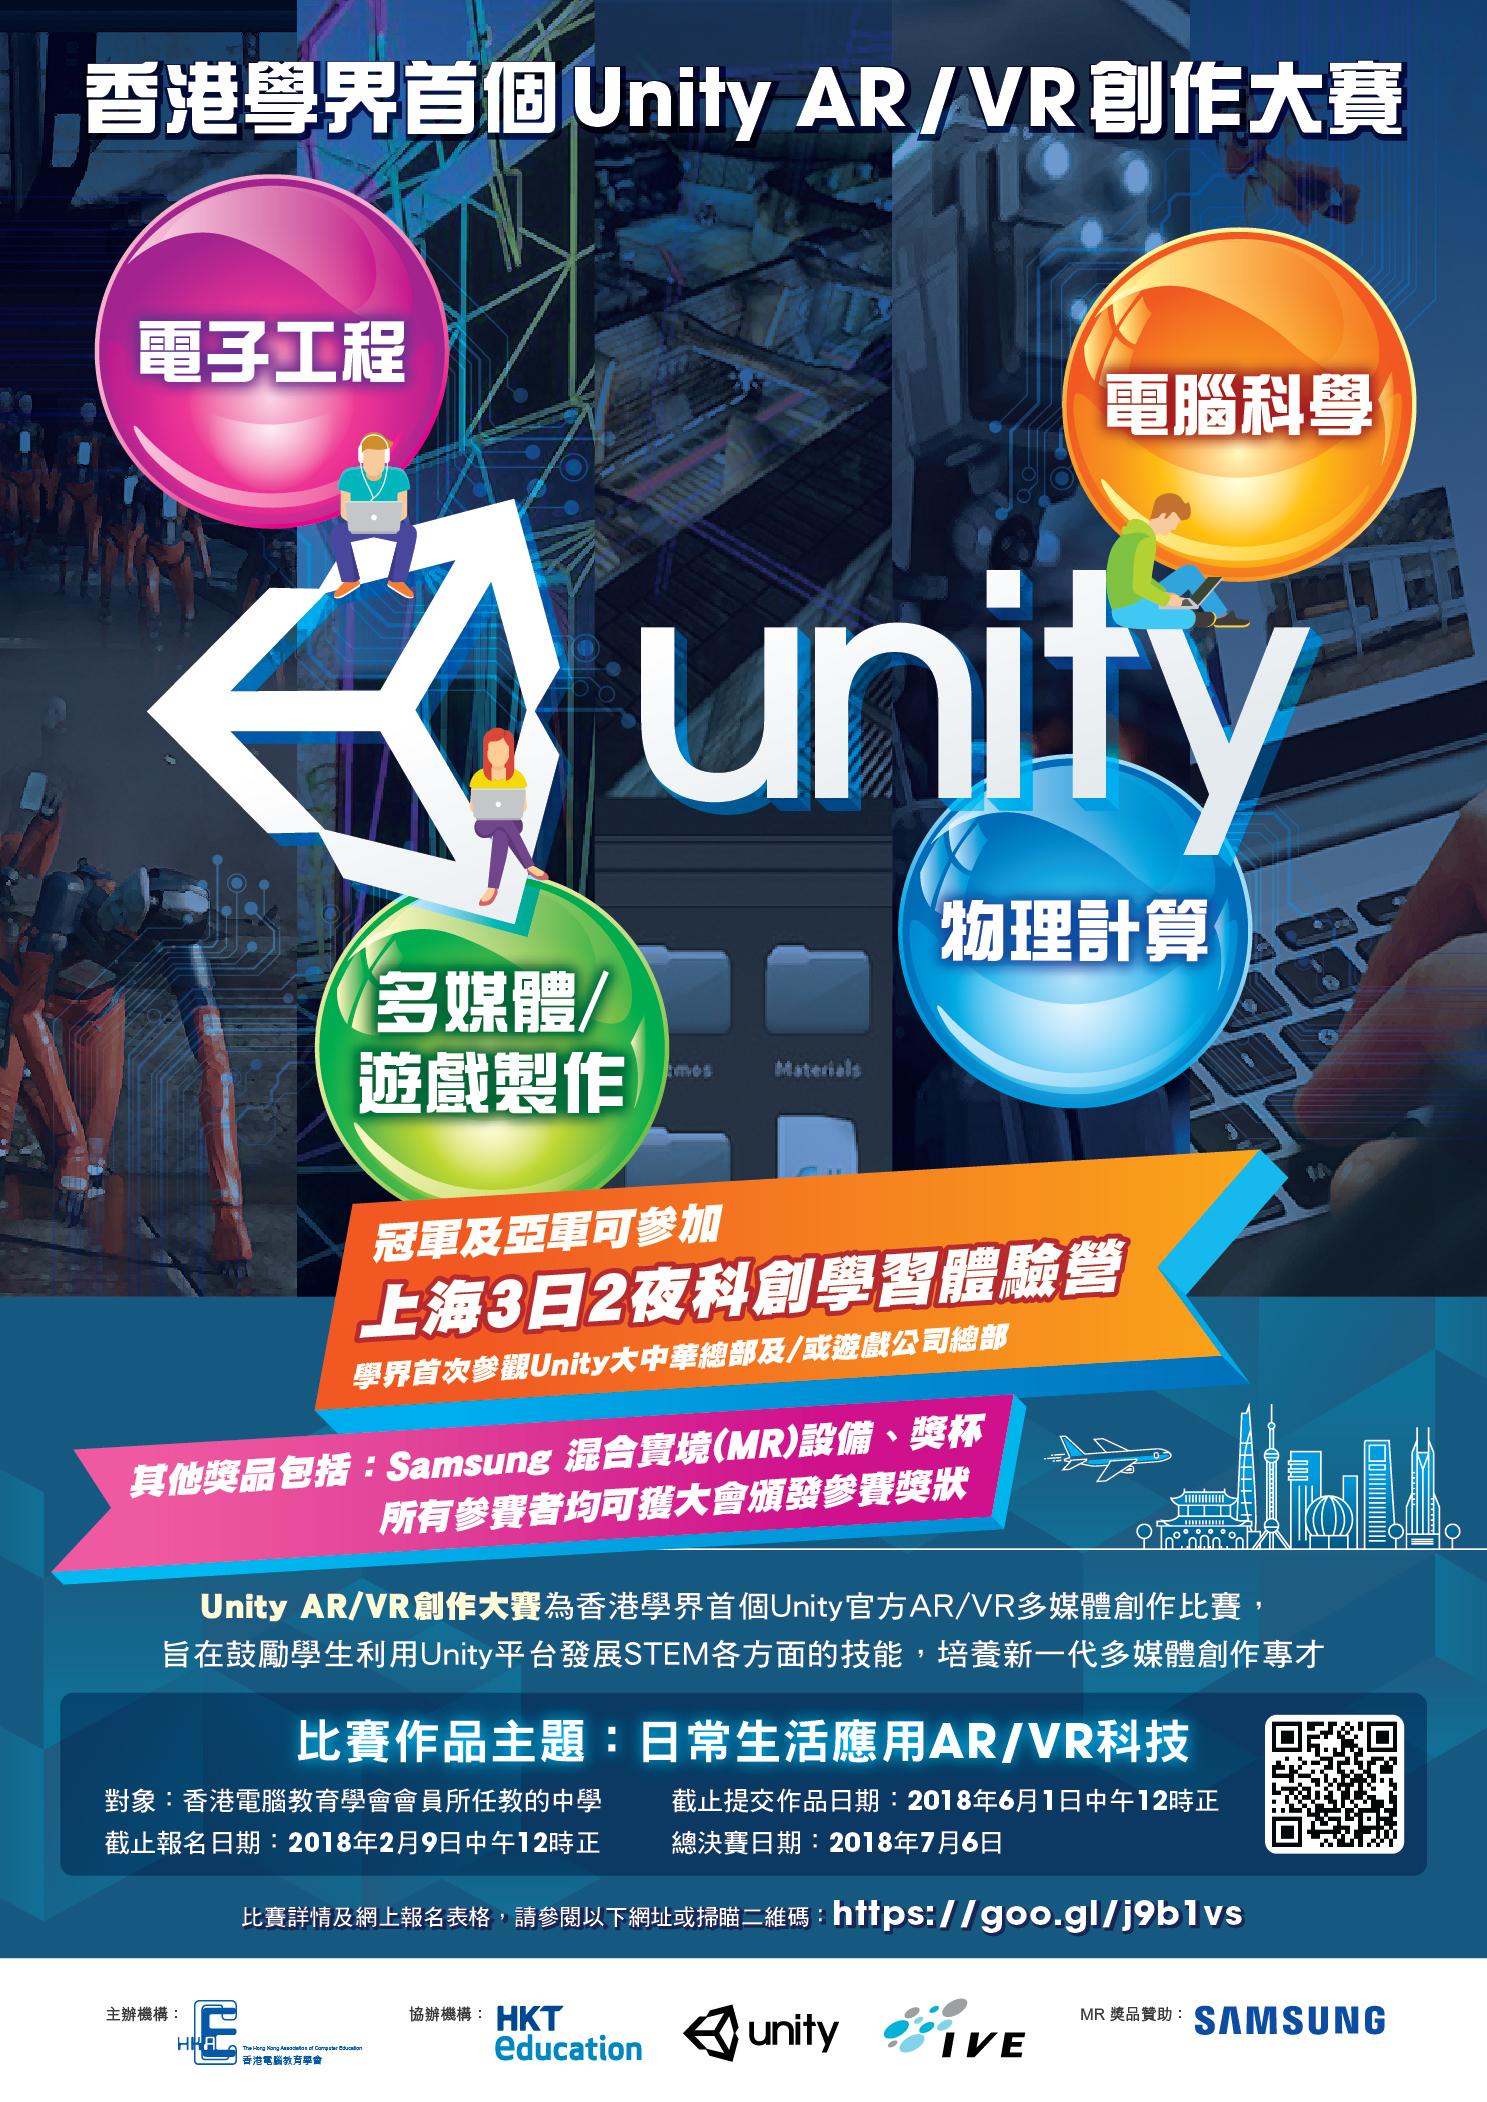 「Unity AR/VR創作大賽」